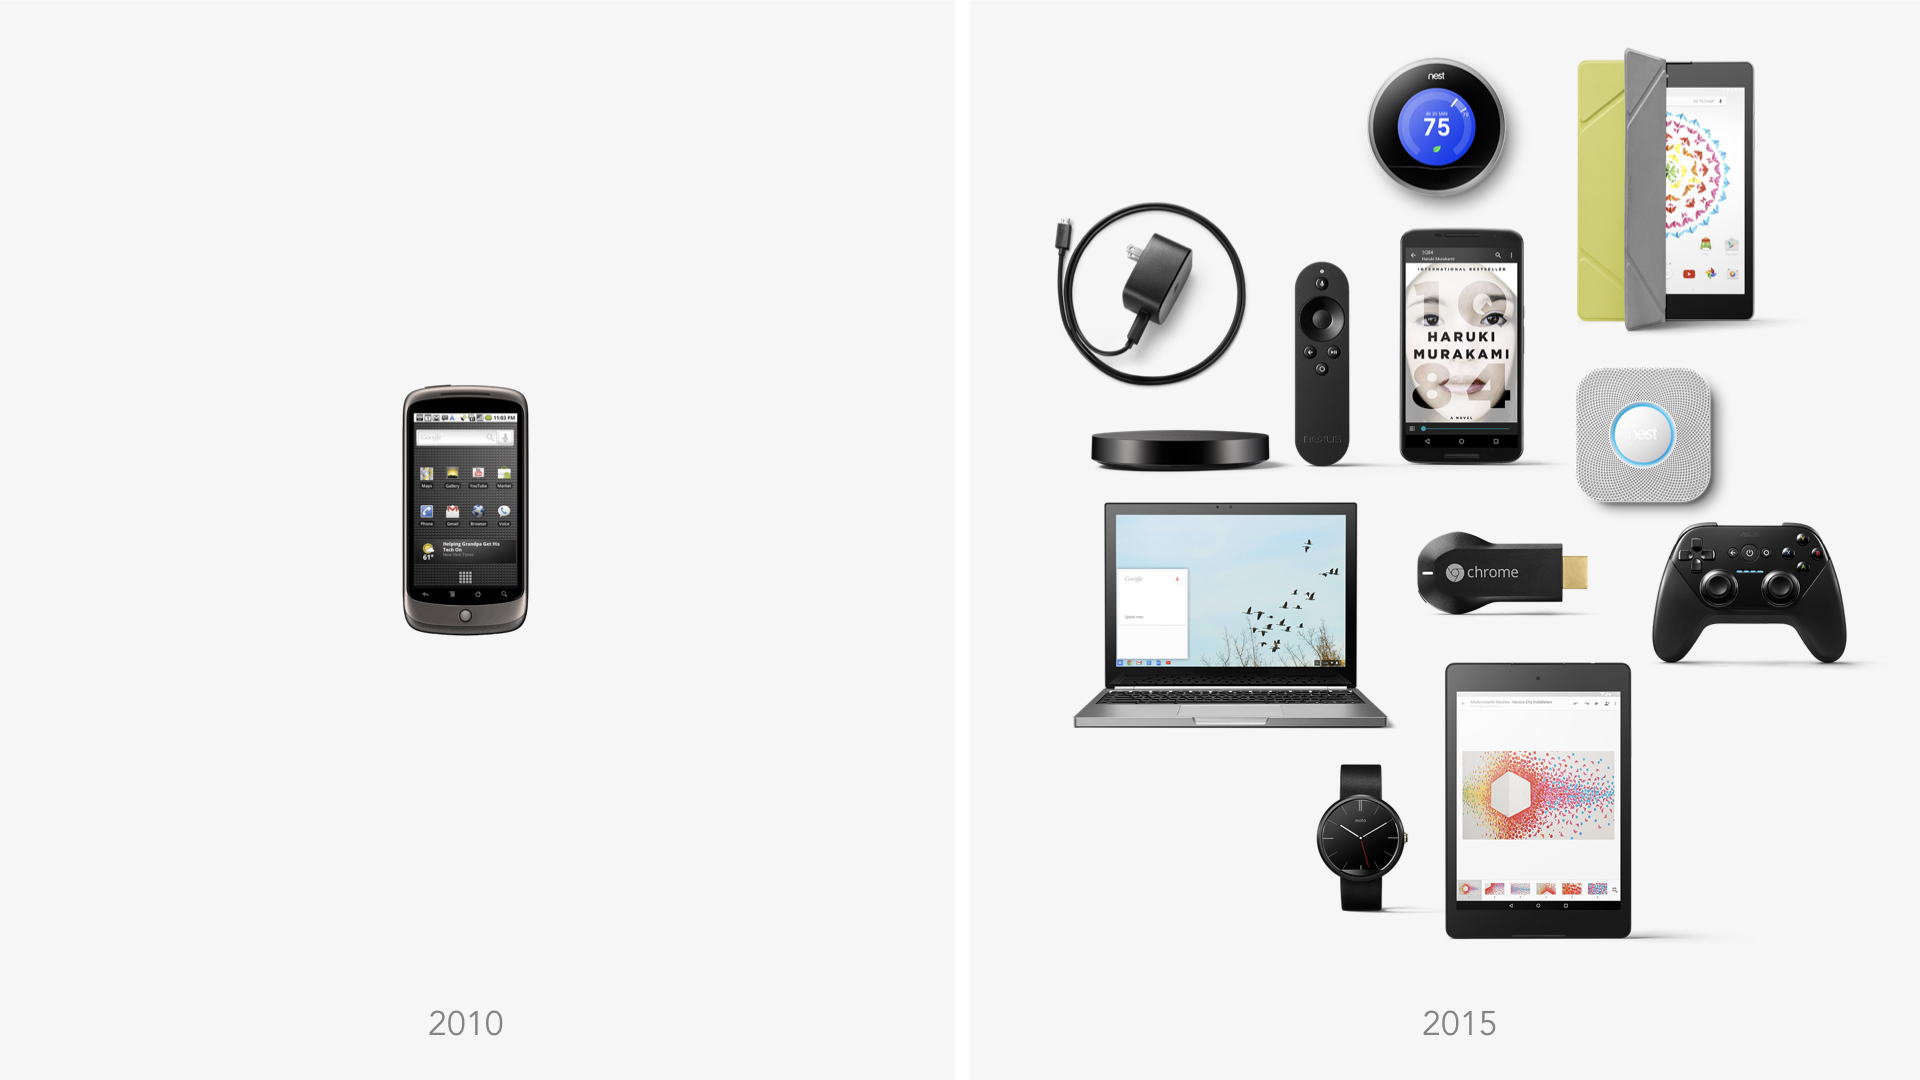 Google Store product evolution